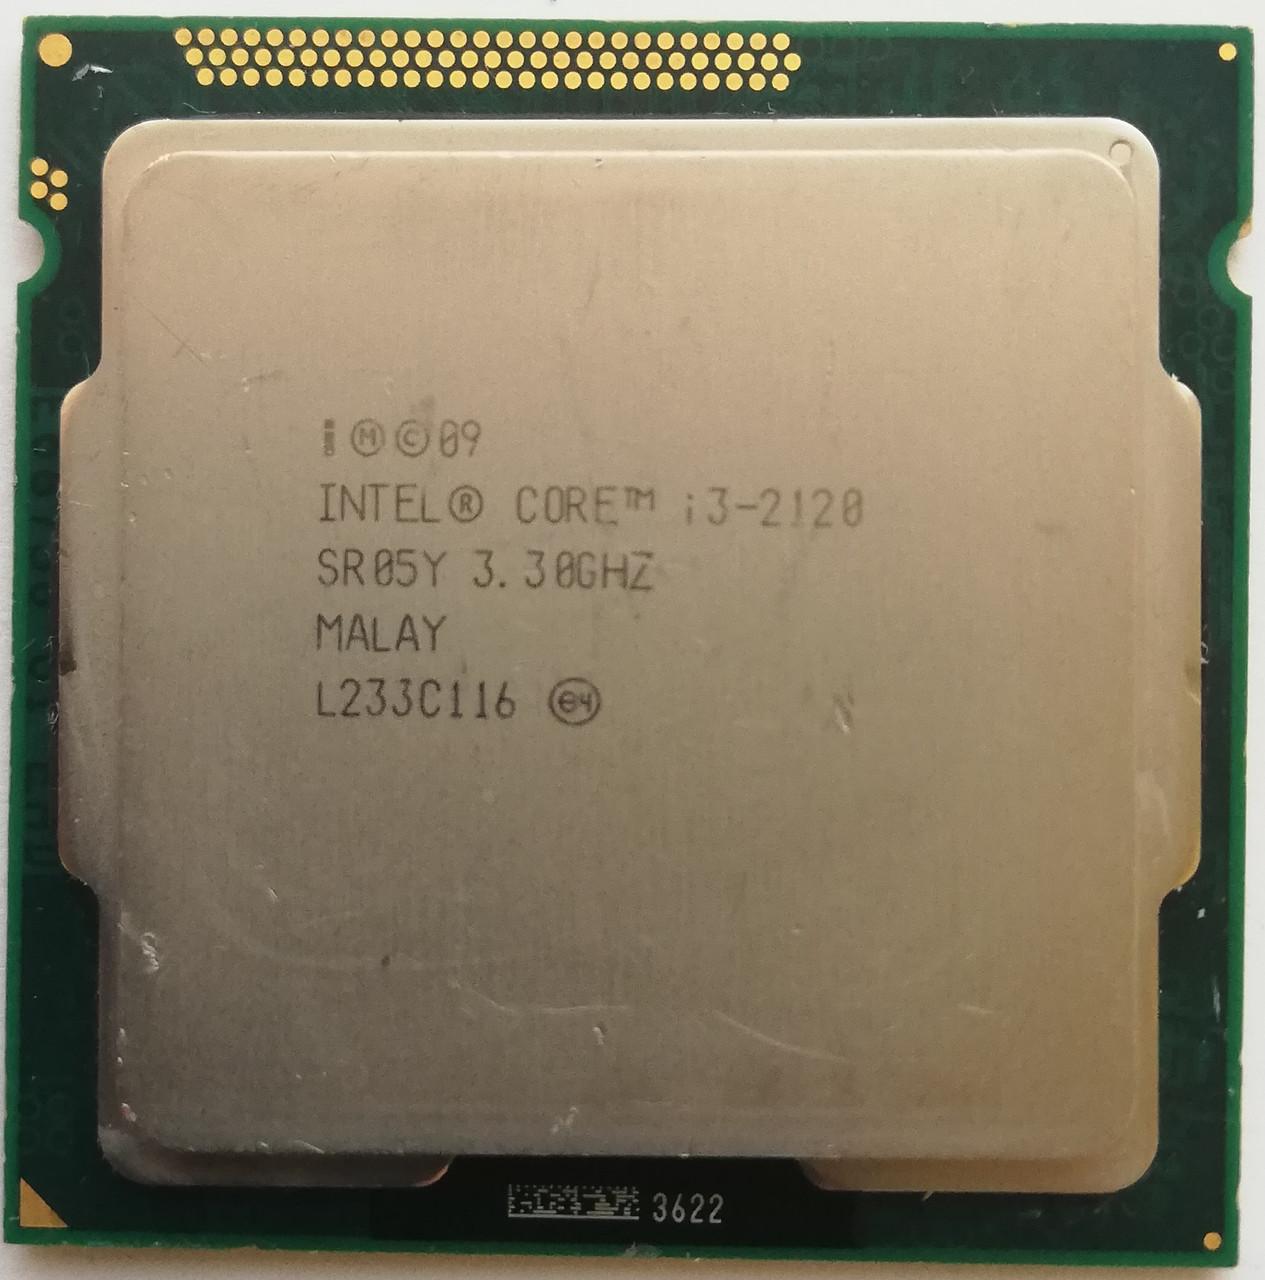 Процессор Intel Core i3-2120 SR05Y 3.3GHz 3M Cache Socket 1155 Б/У